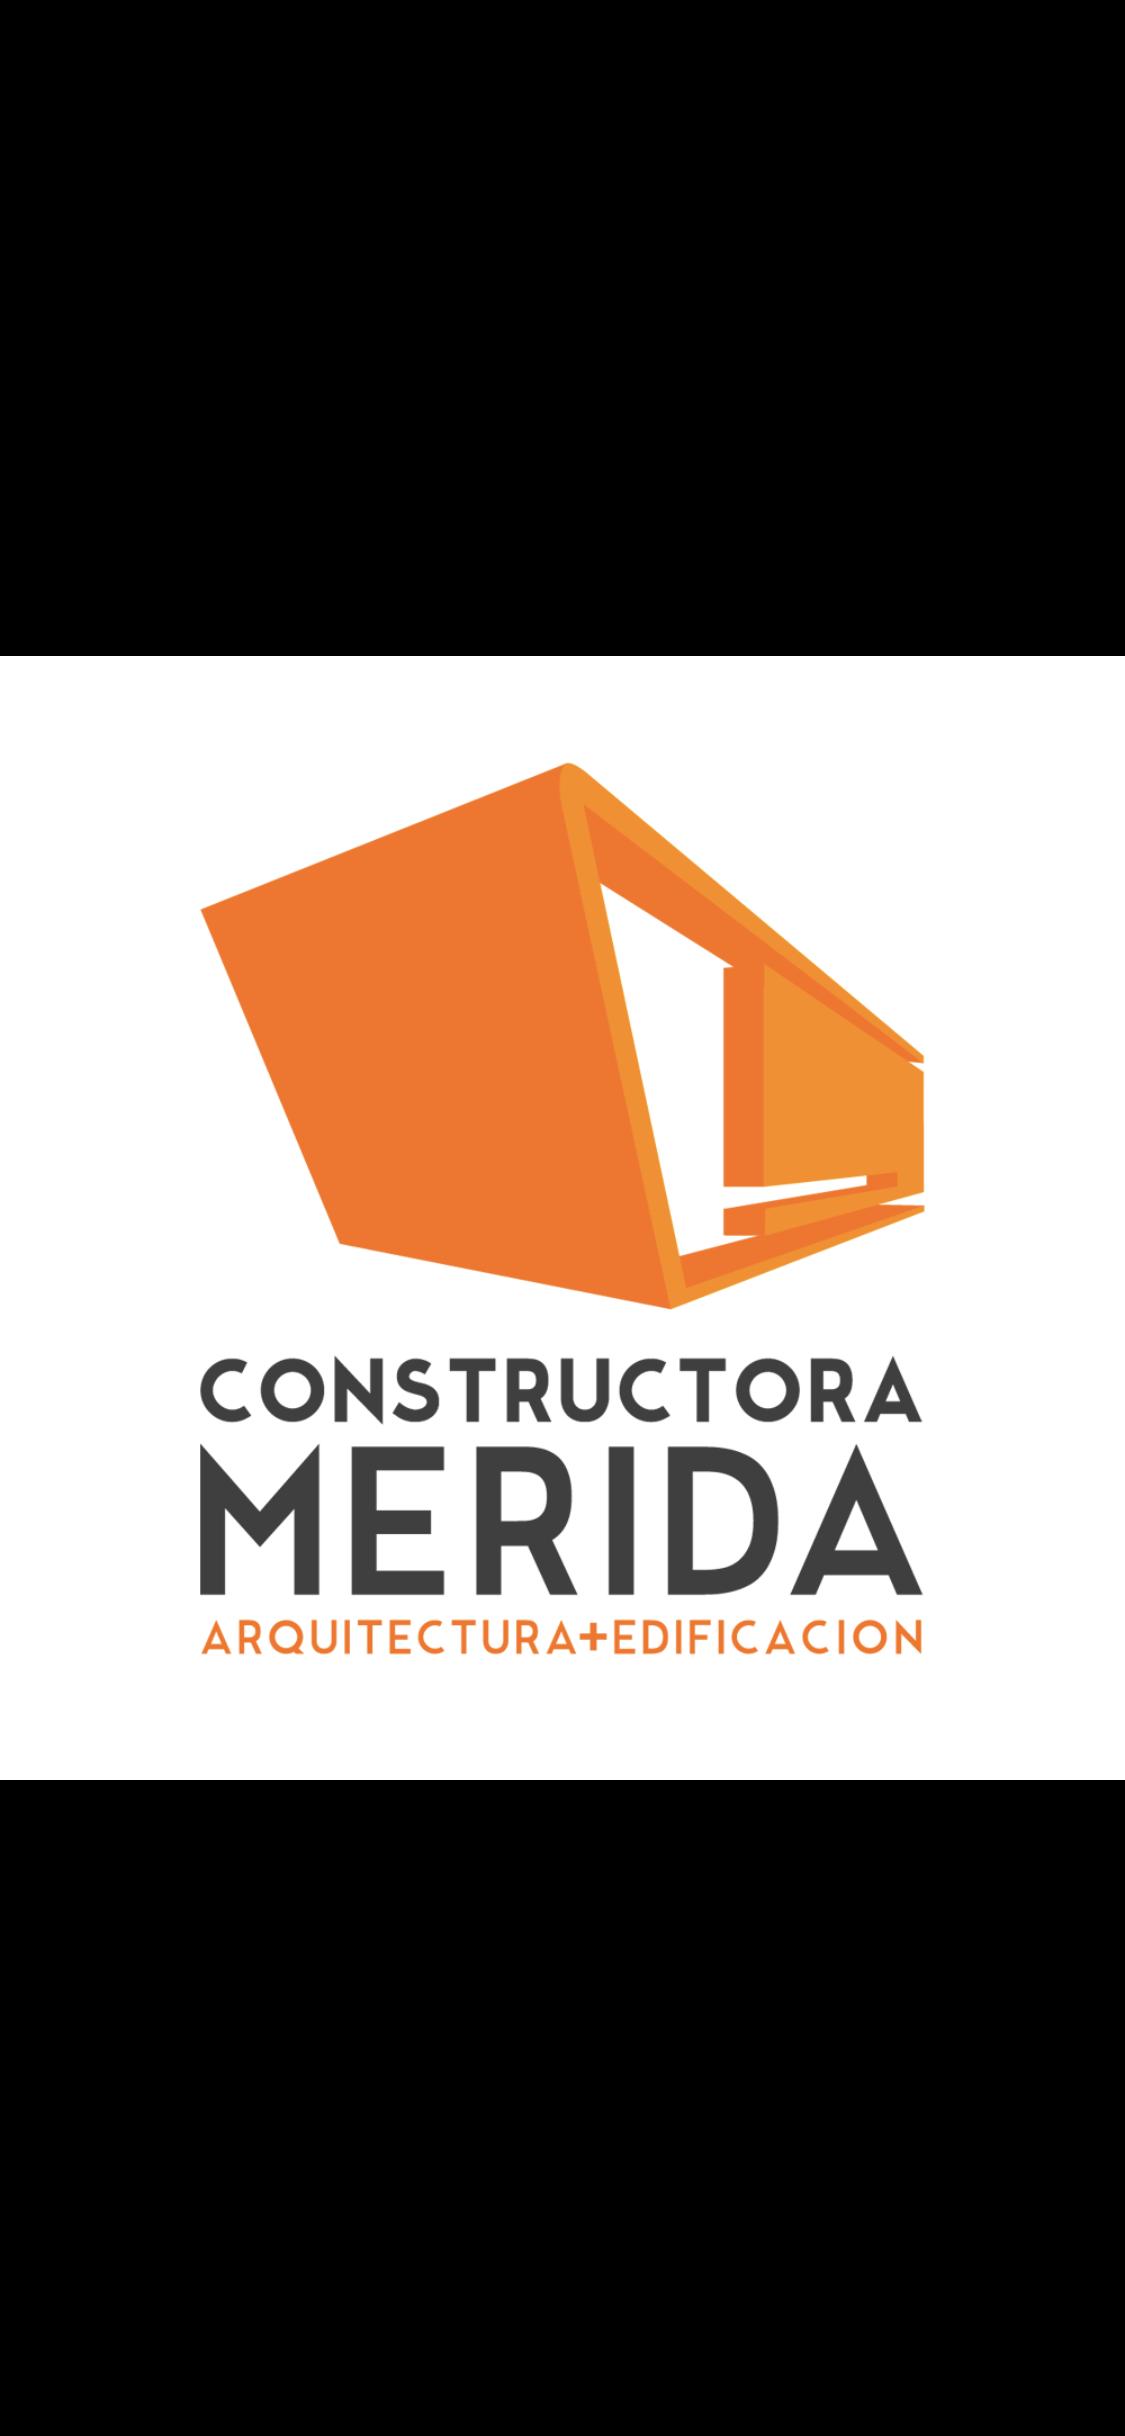 Constructora Mérida